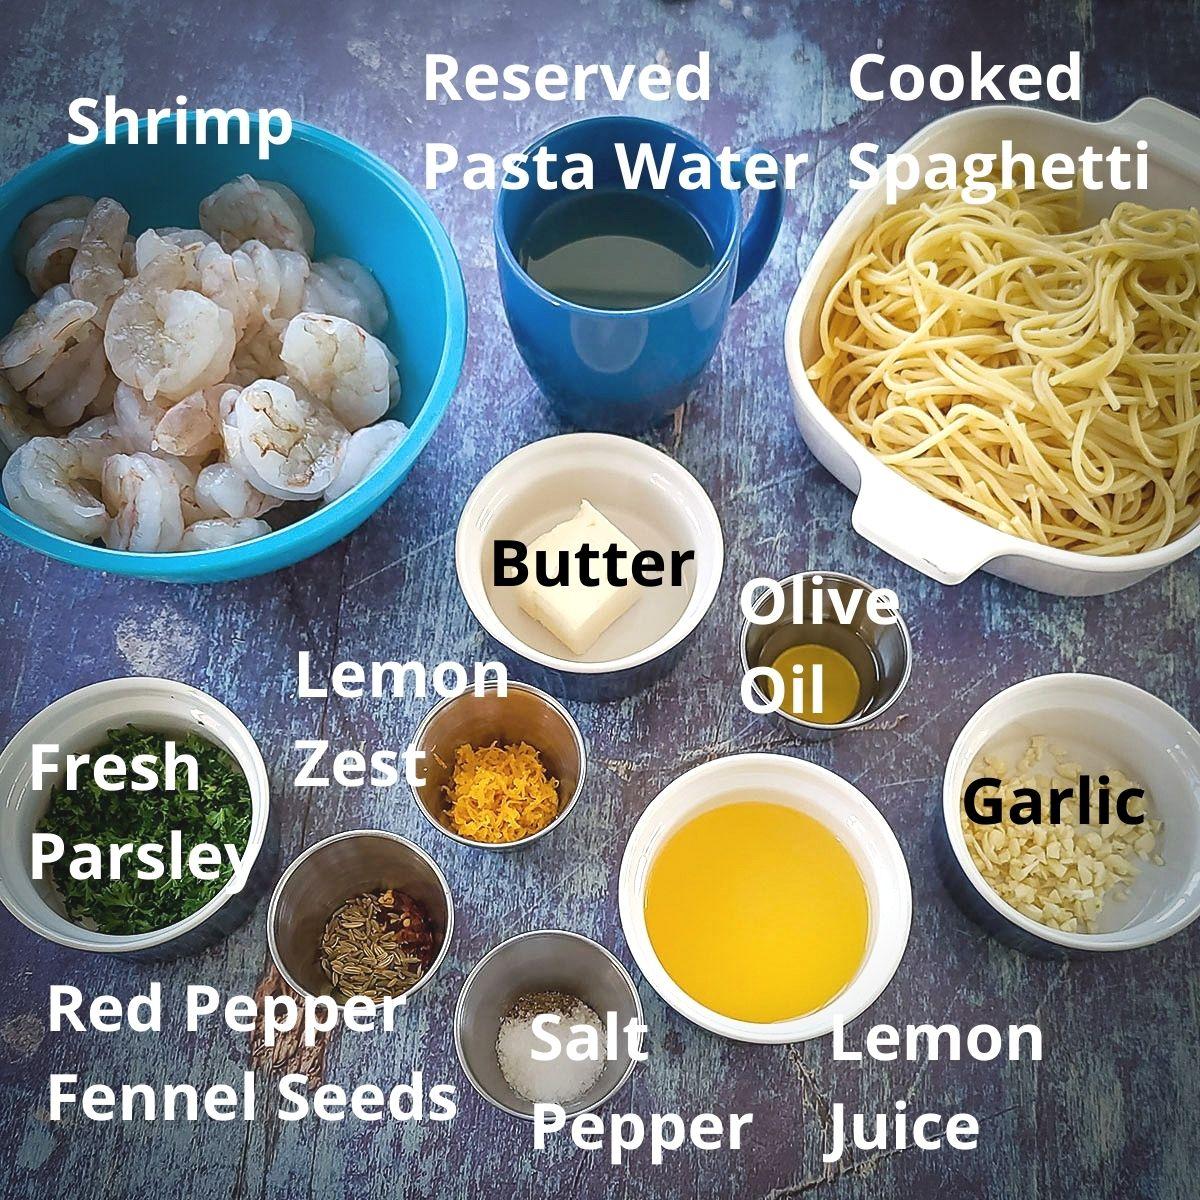 ingredients needed for lemon fennel shrimp